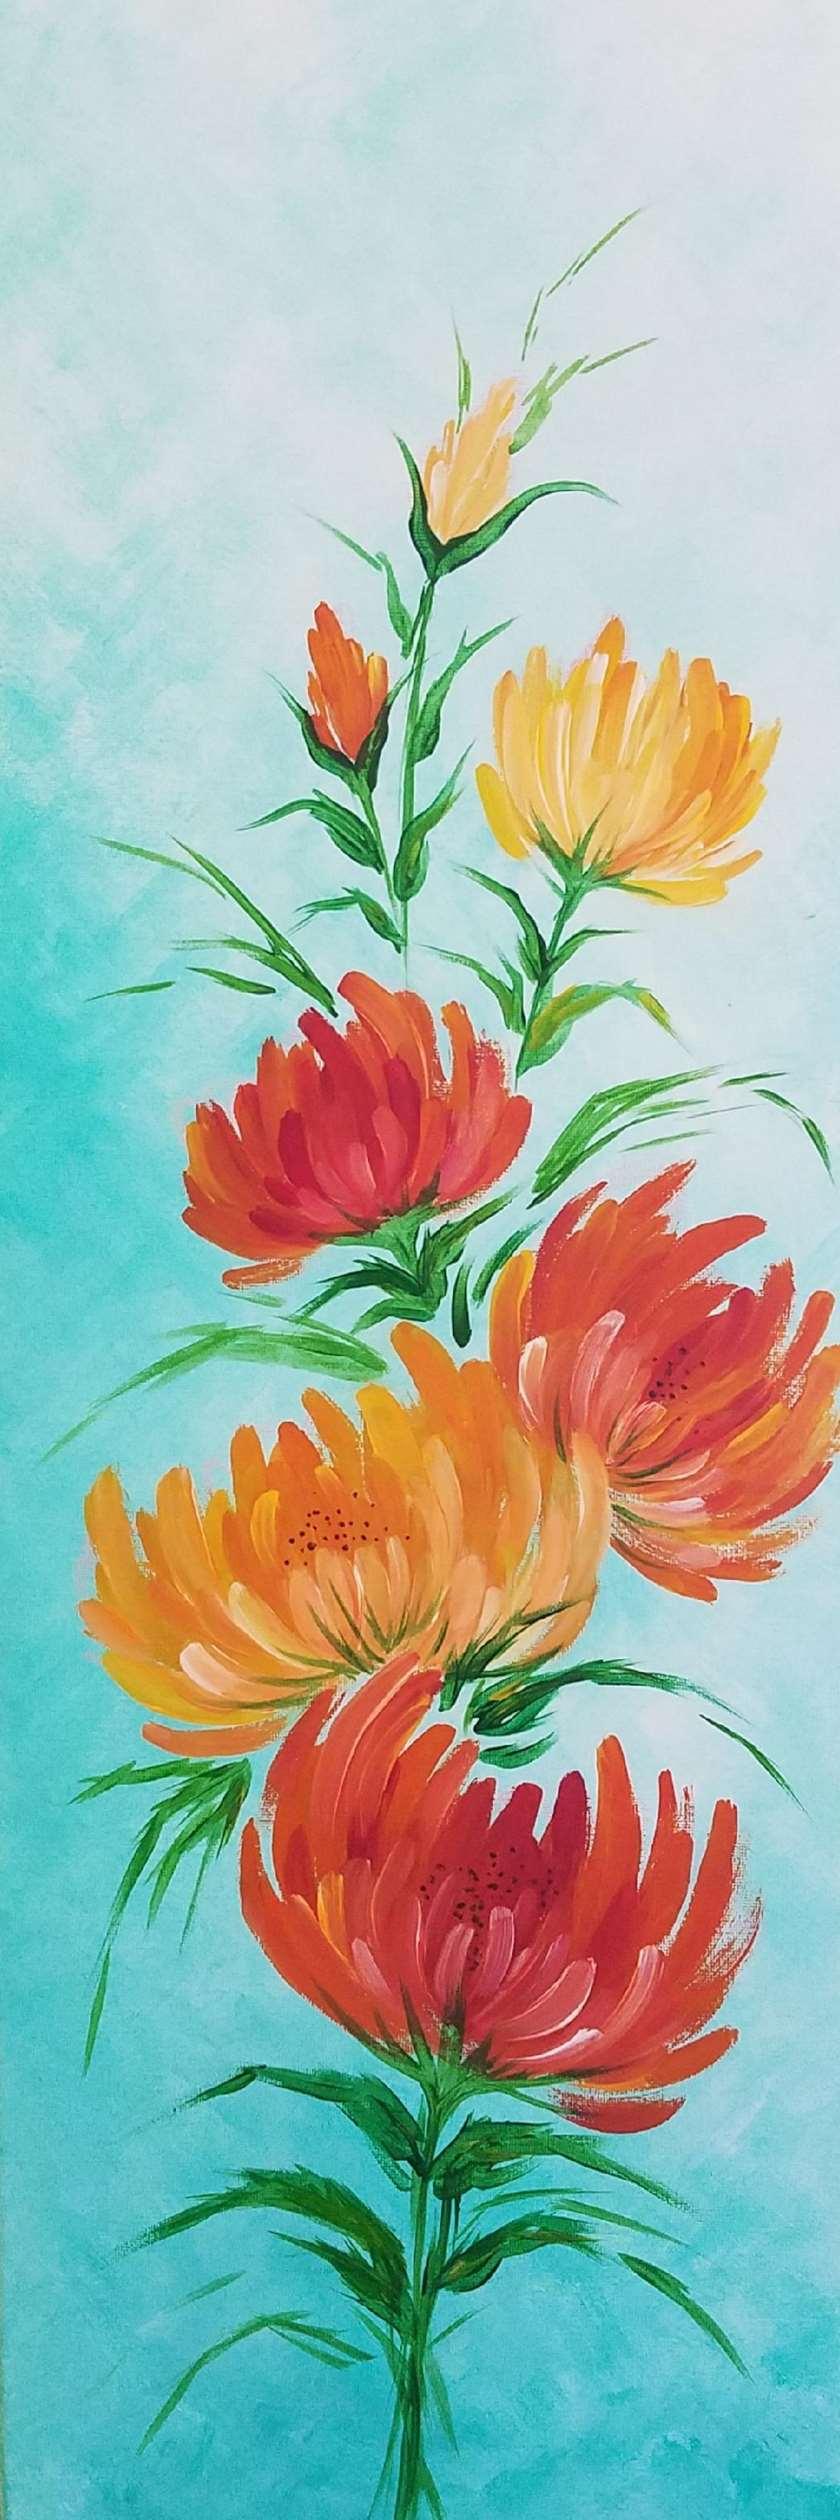 Spring Orange Blossoms